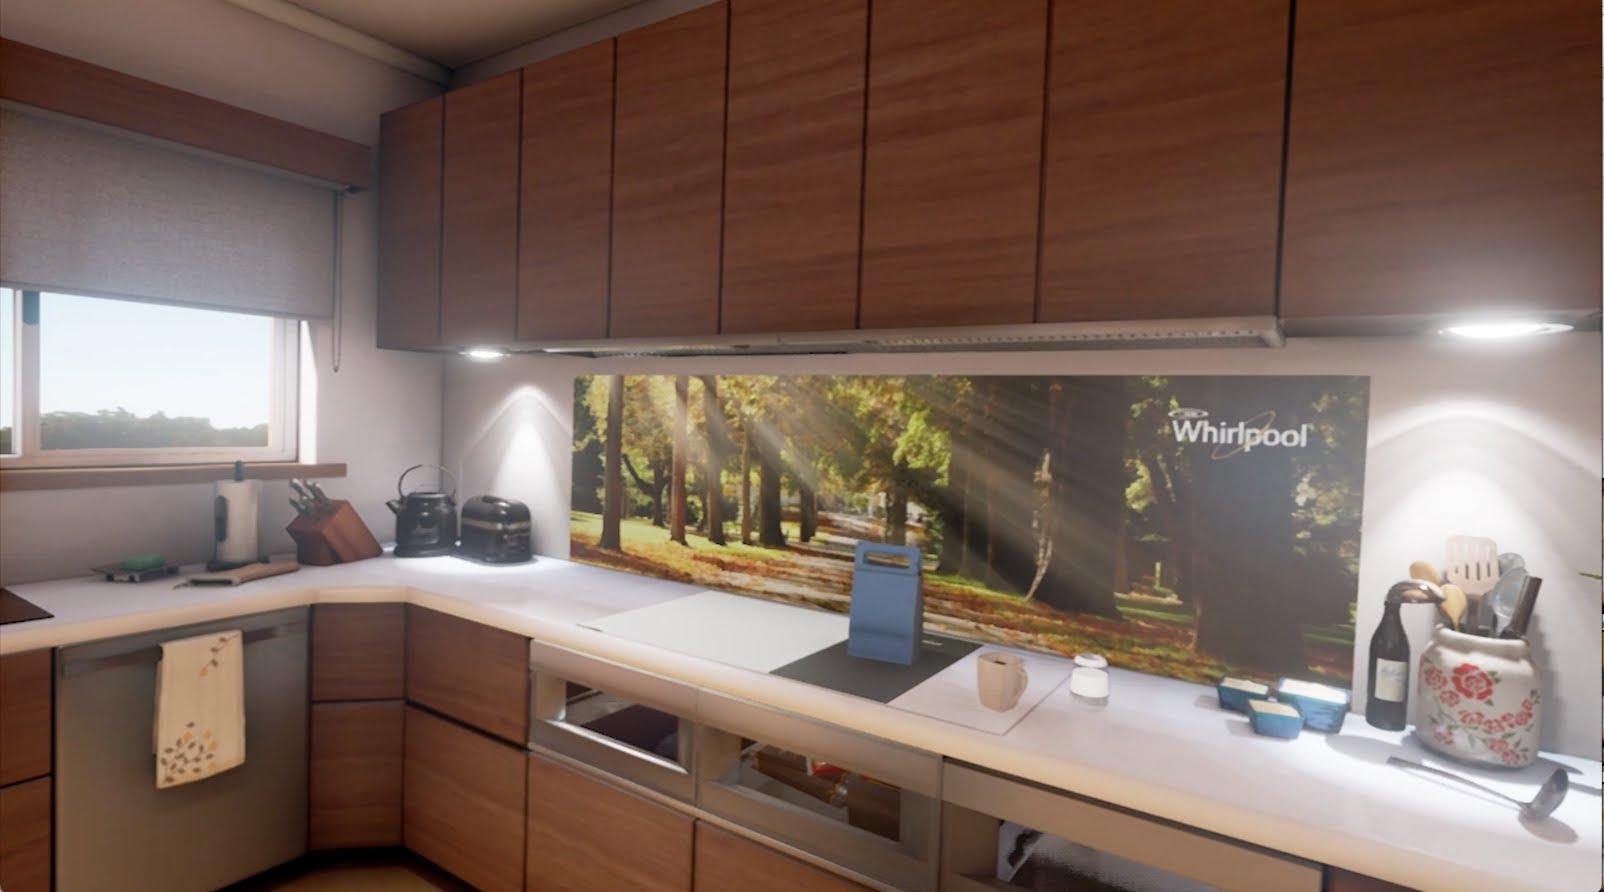 Whirlpool interactive kitchen